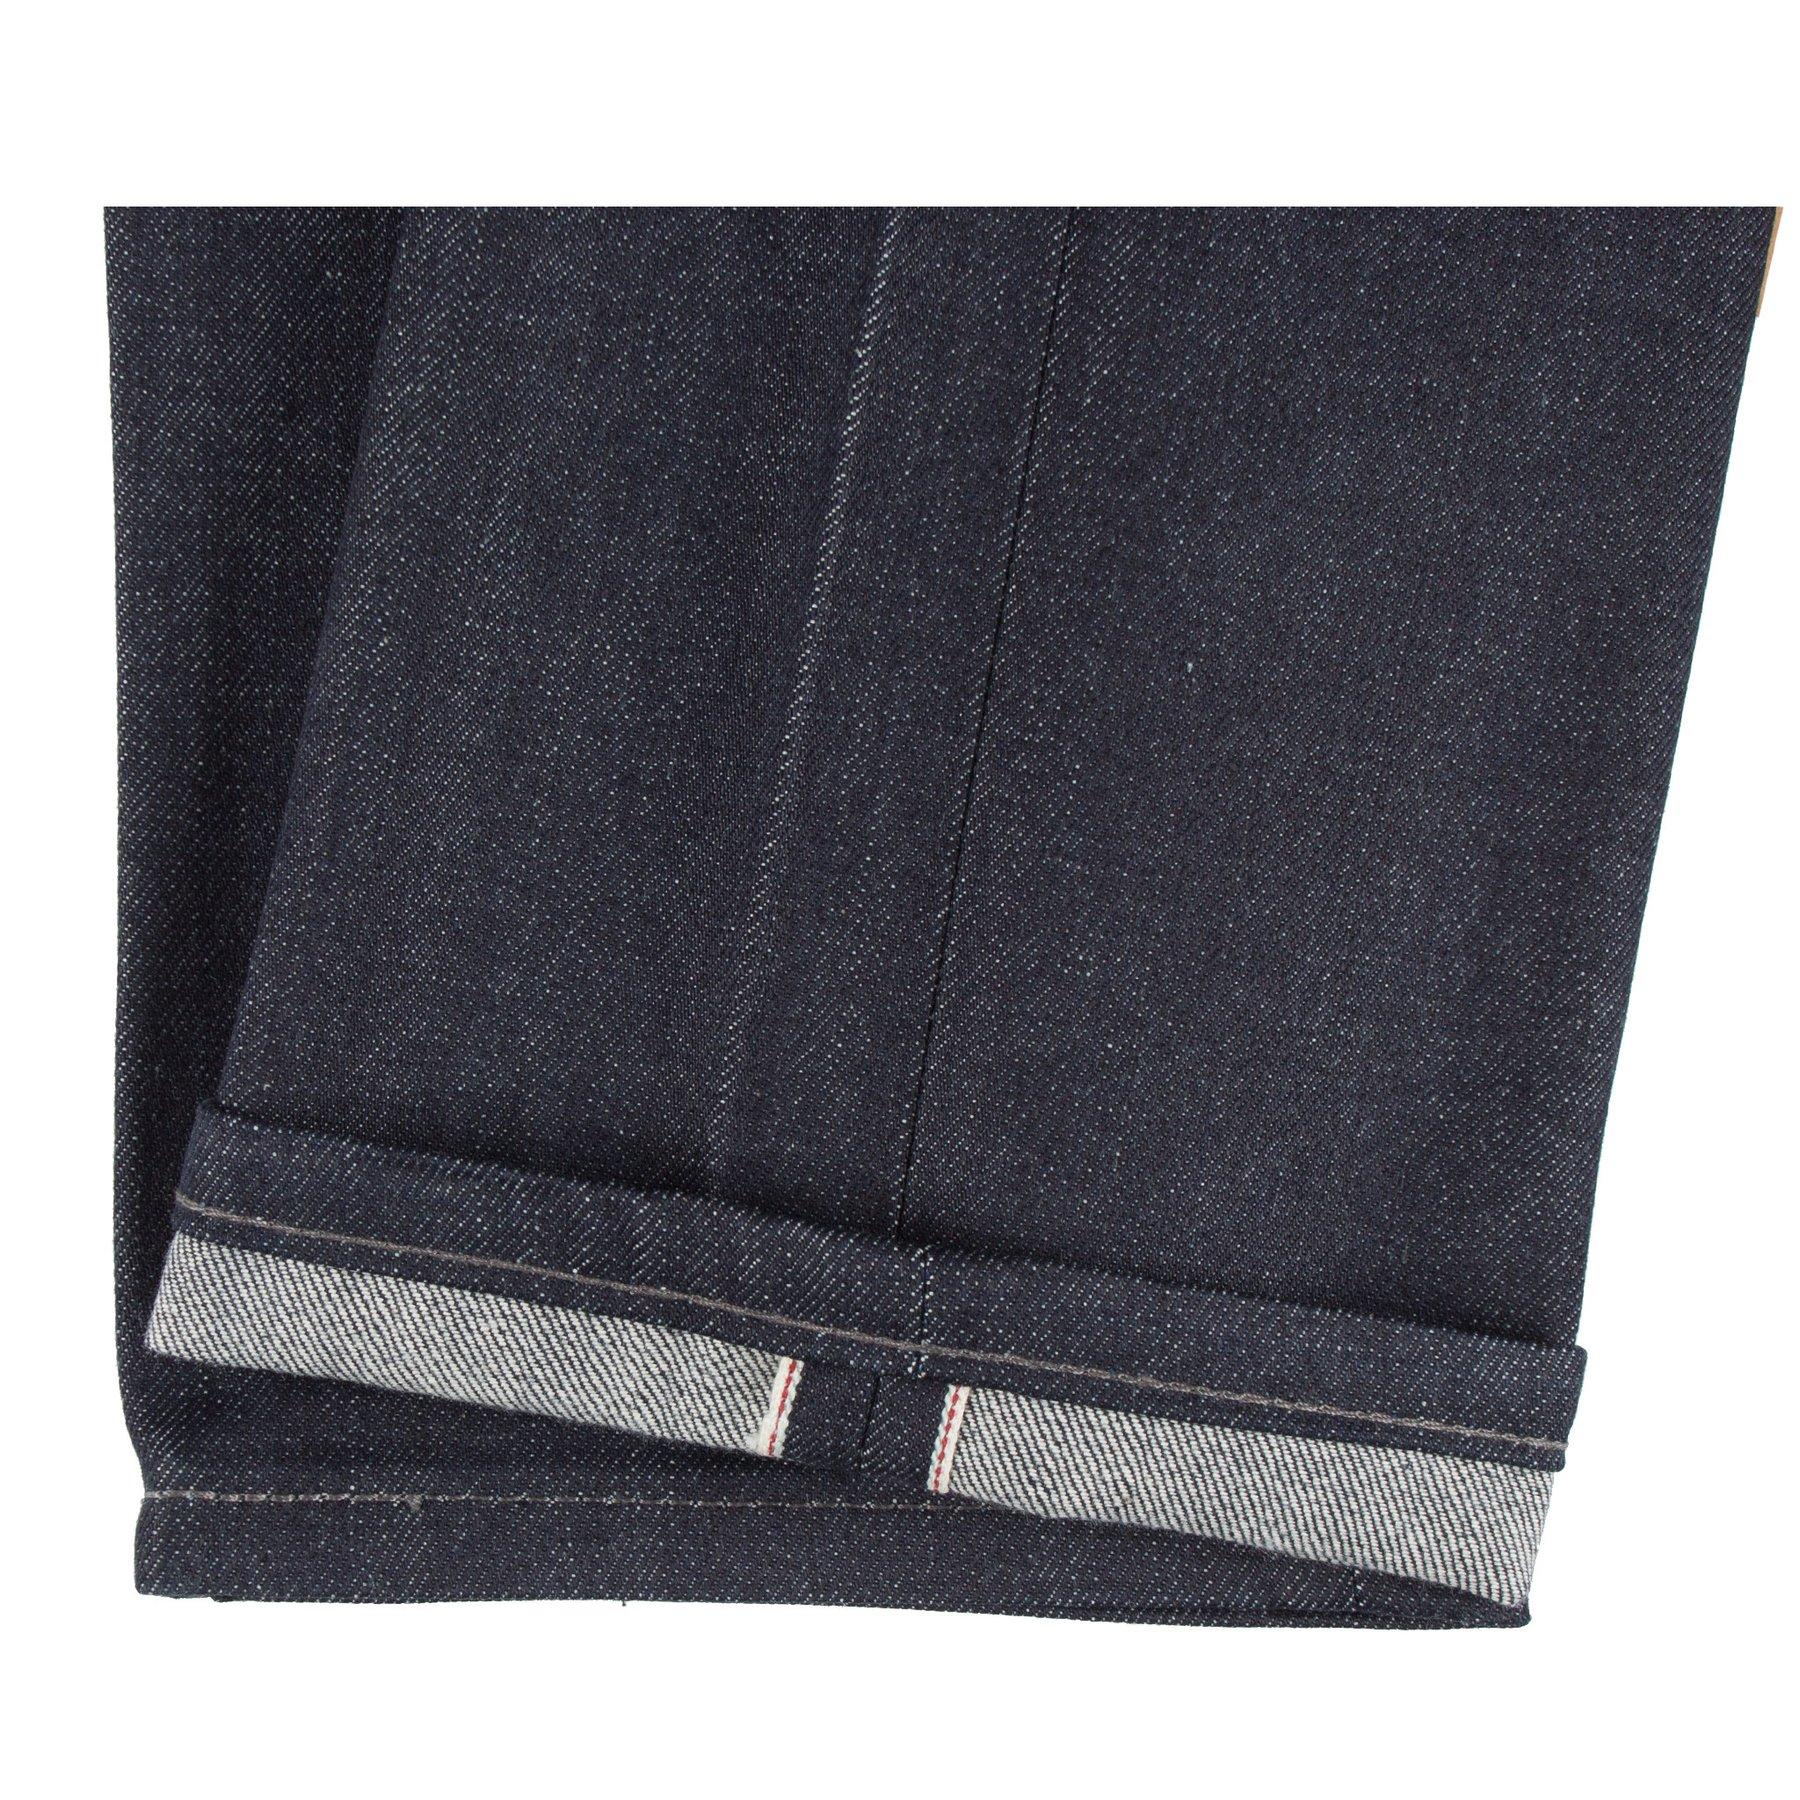 Indigo Selvedge Jeans hem